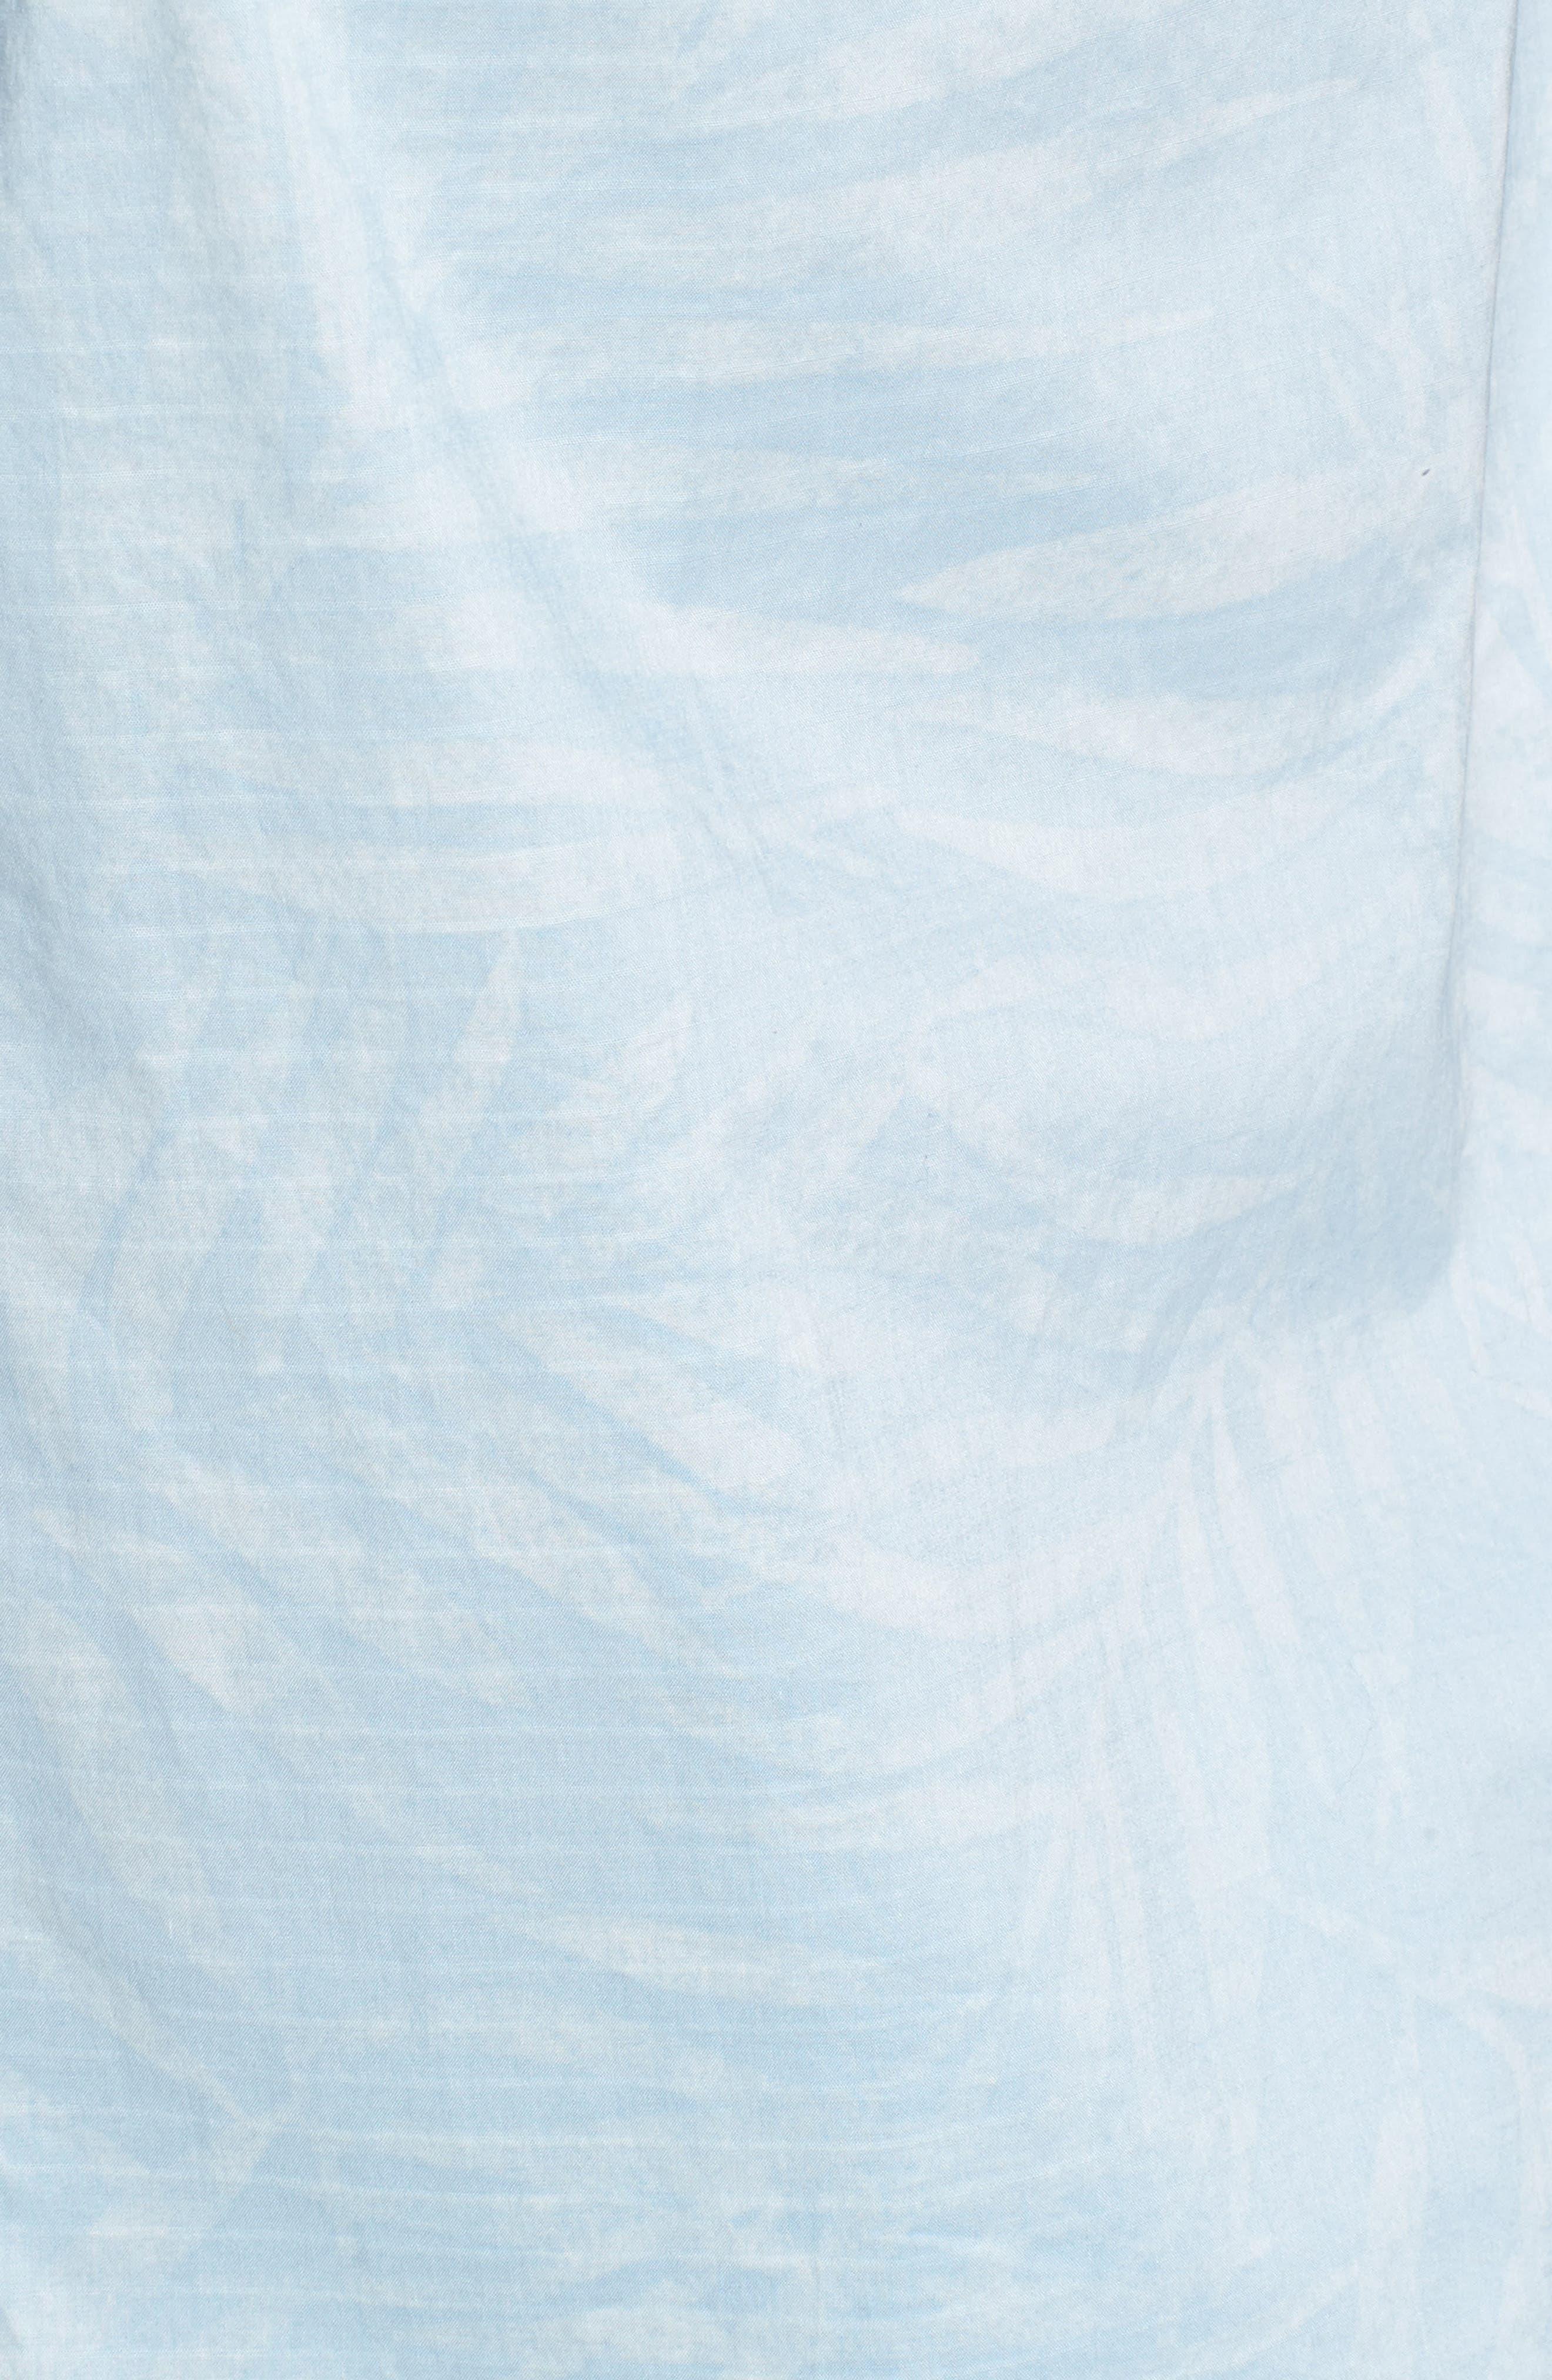 Vero Fronds Sport Shirt,                             Alternate thumbnail 5, color,                             Opal